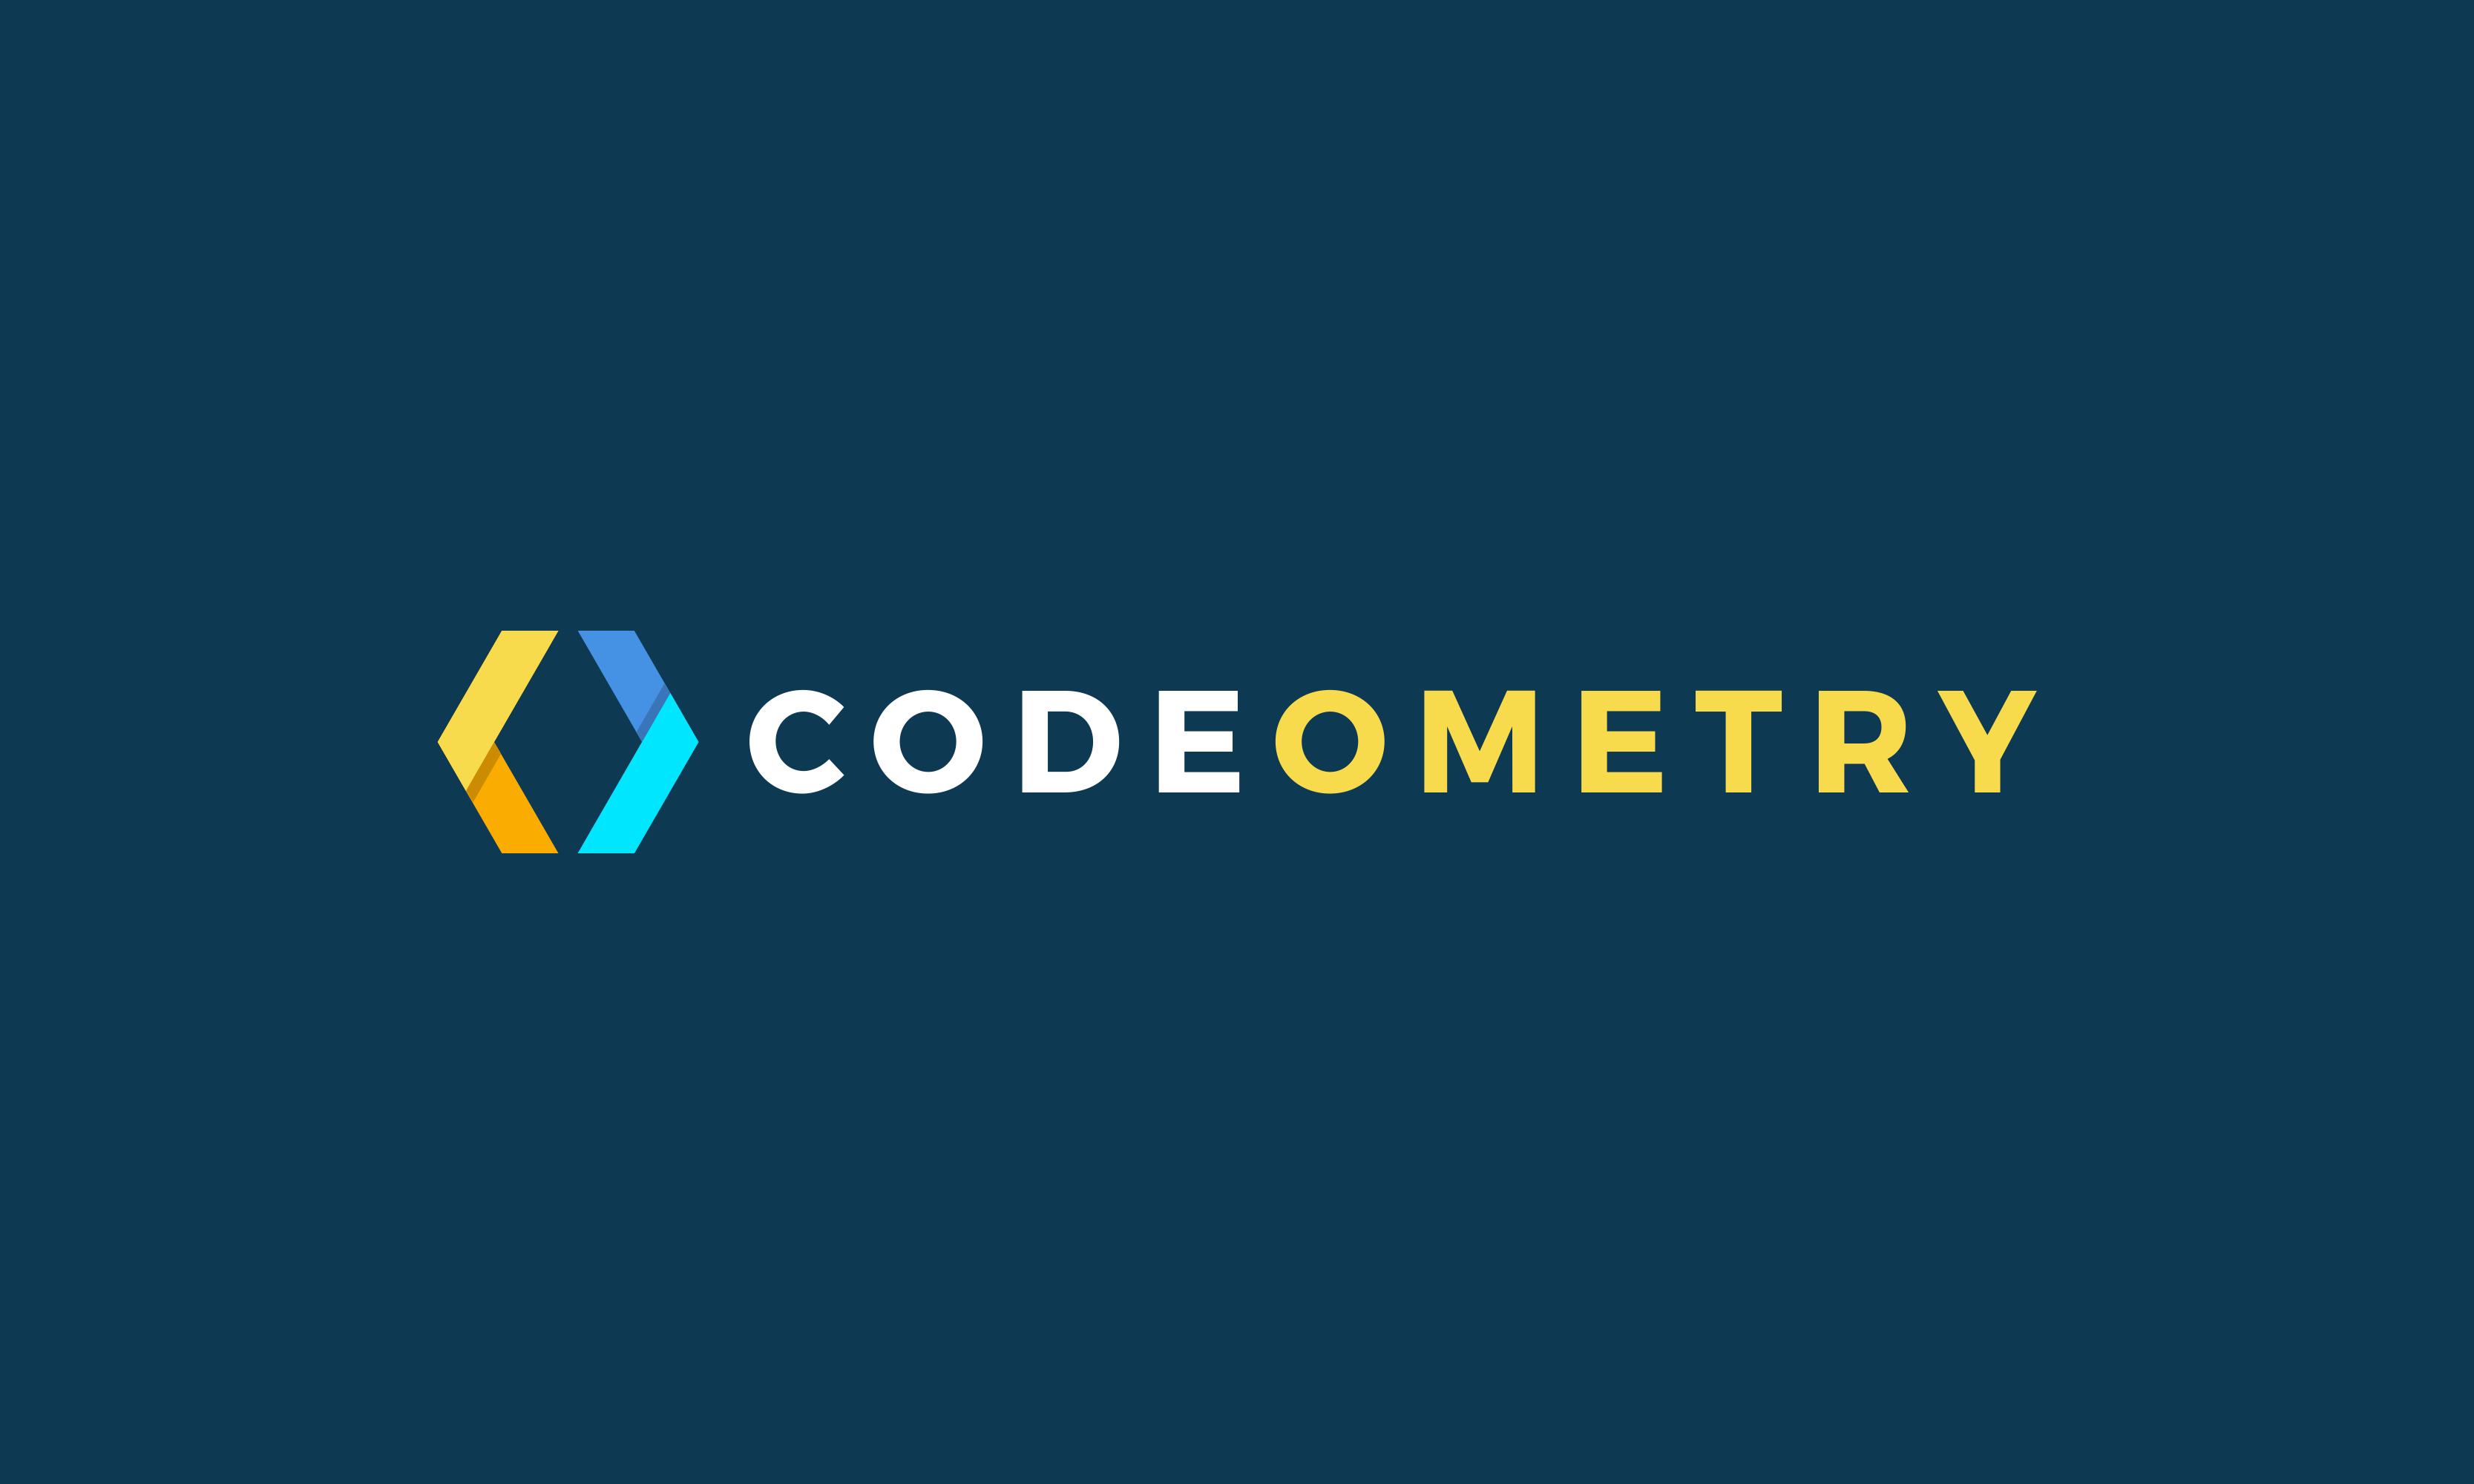 Codeometry